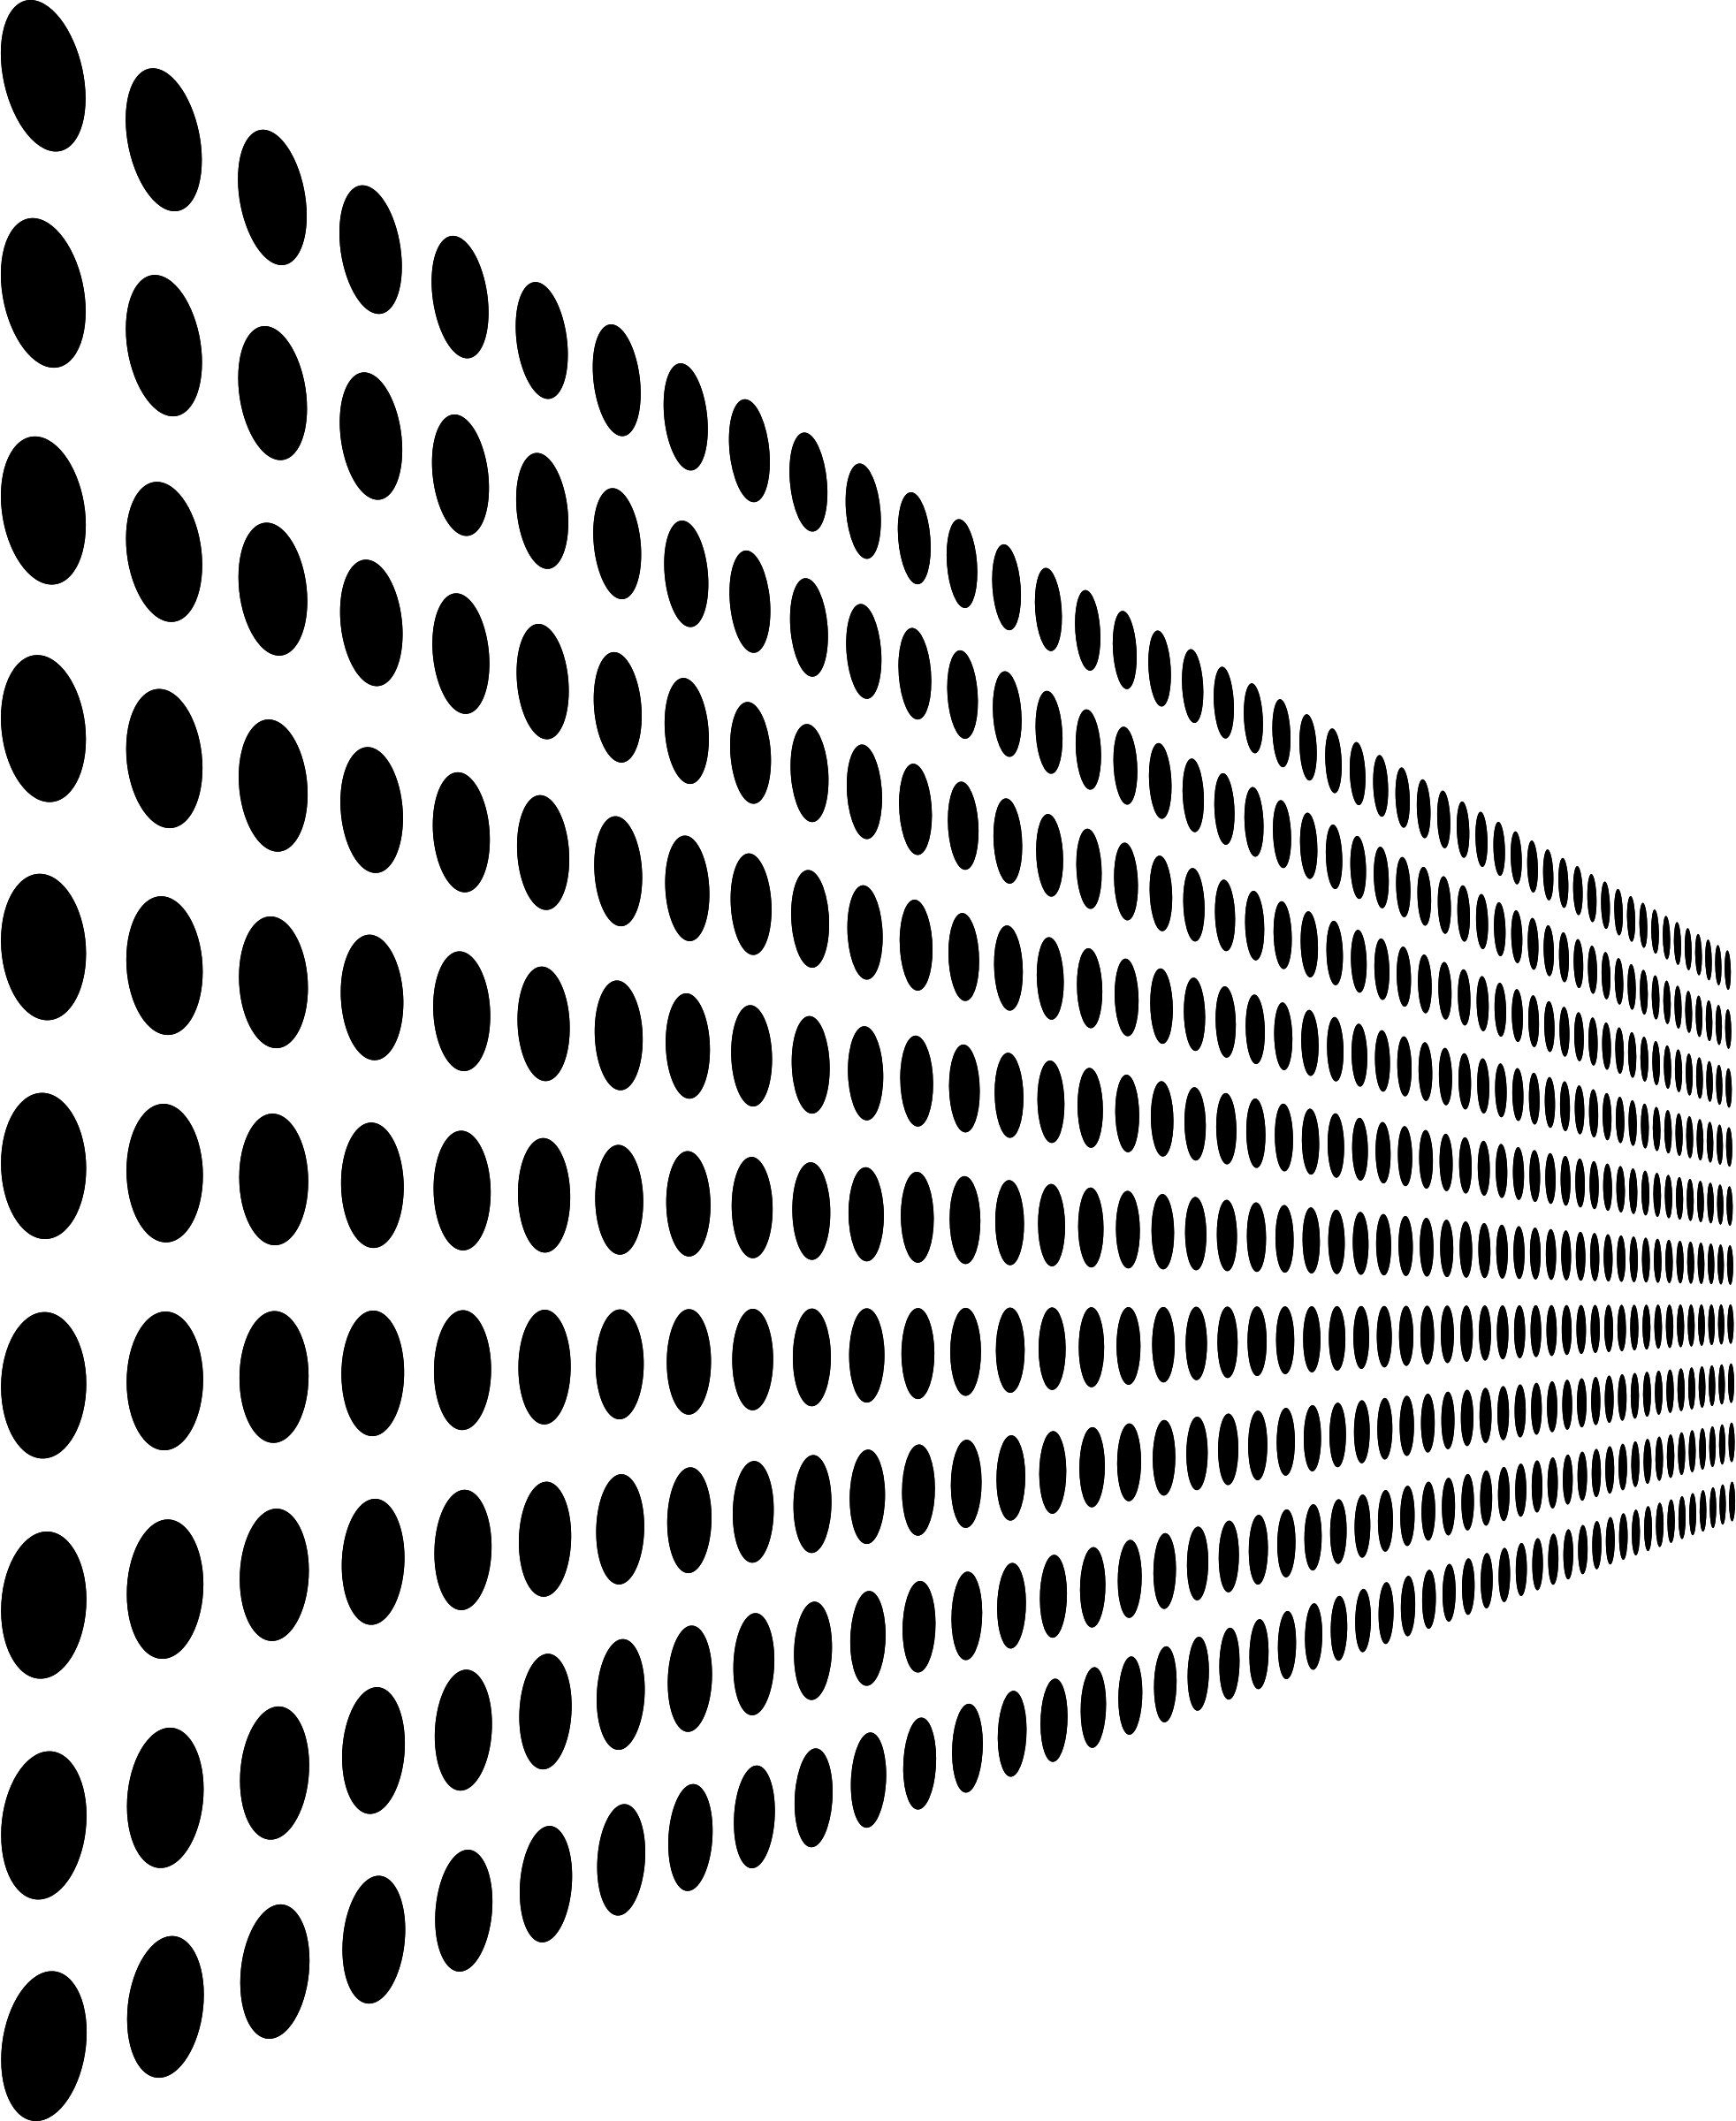 BIG IMAGE (PNG) - Ama Black Vector PNG